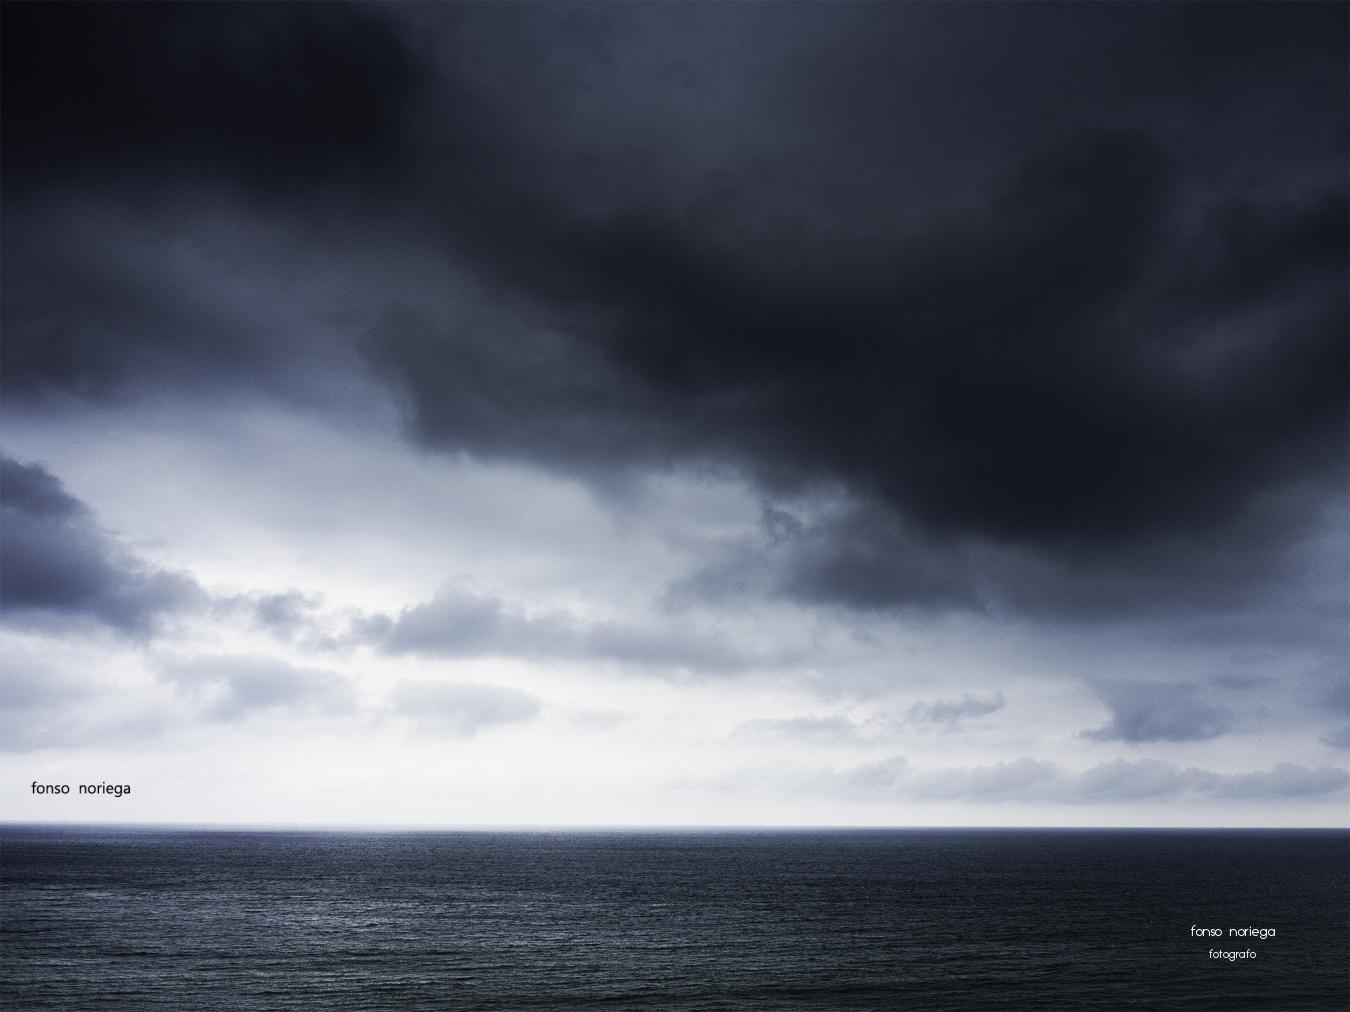 tormenta - color - fonso noriega, fotógrafo